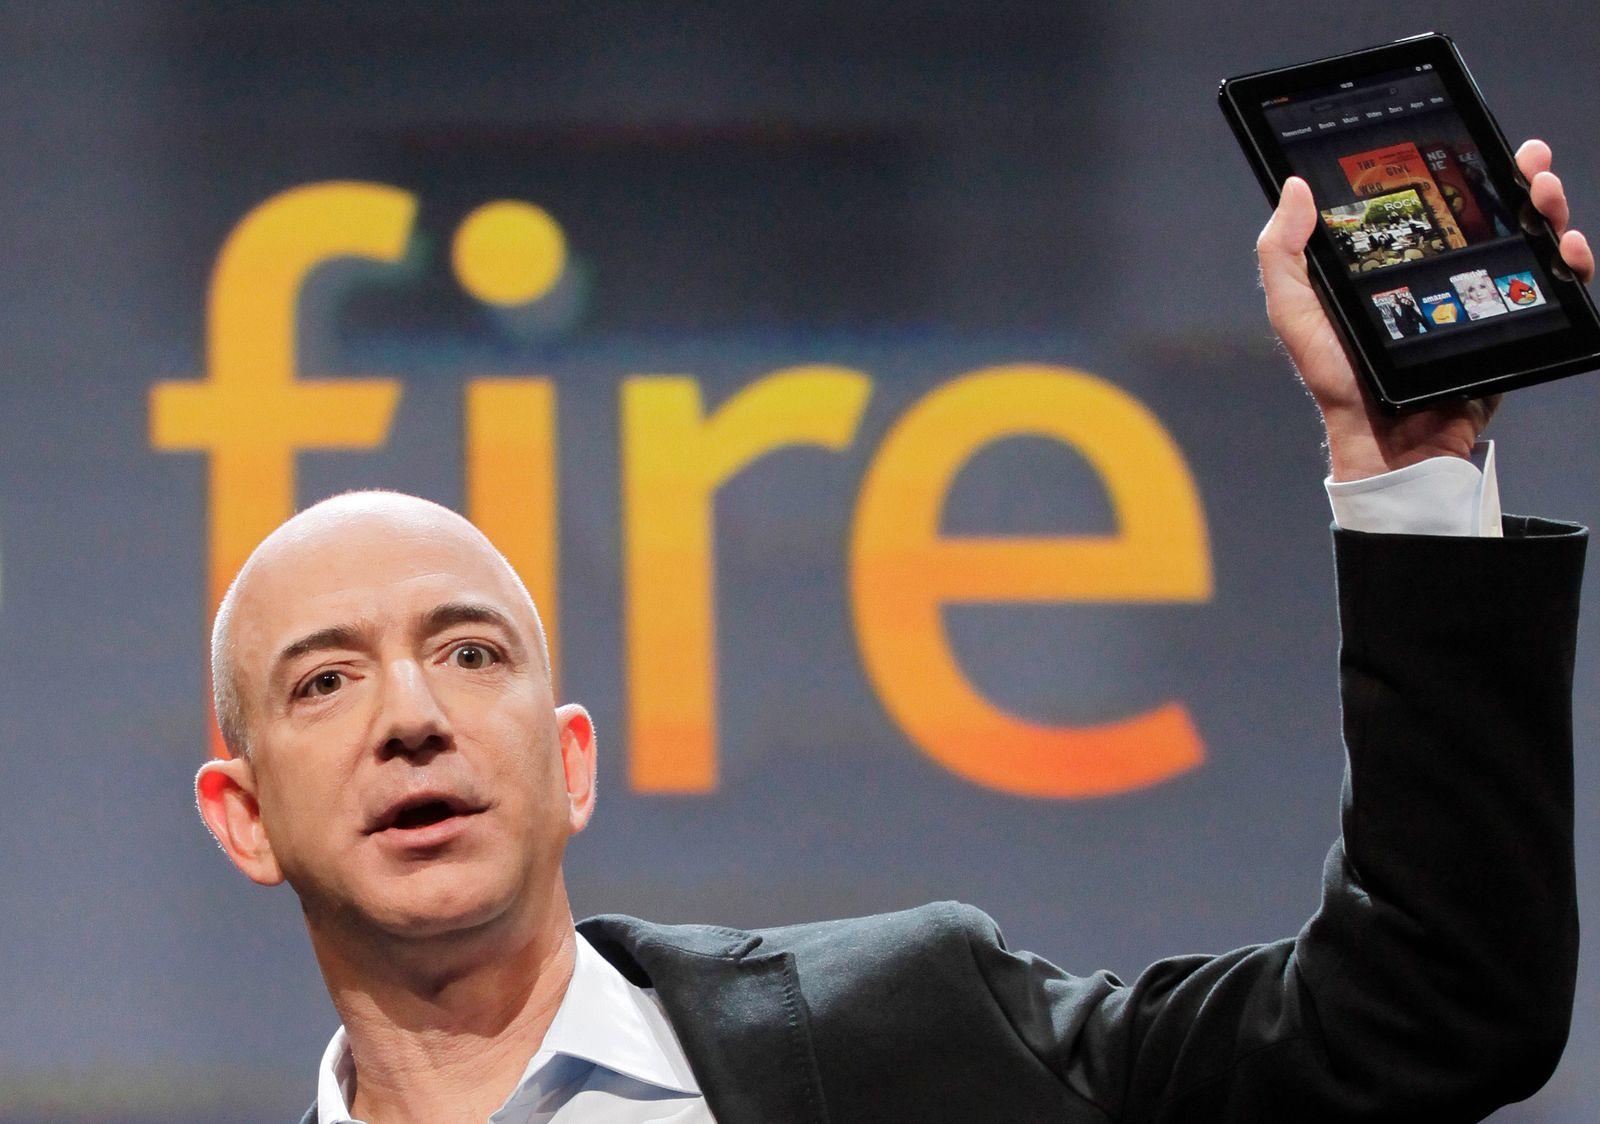 Amazon Tablet / Kindle Fire